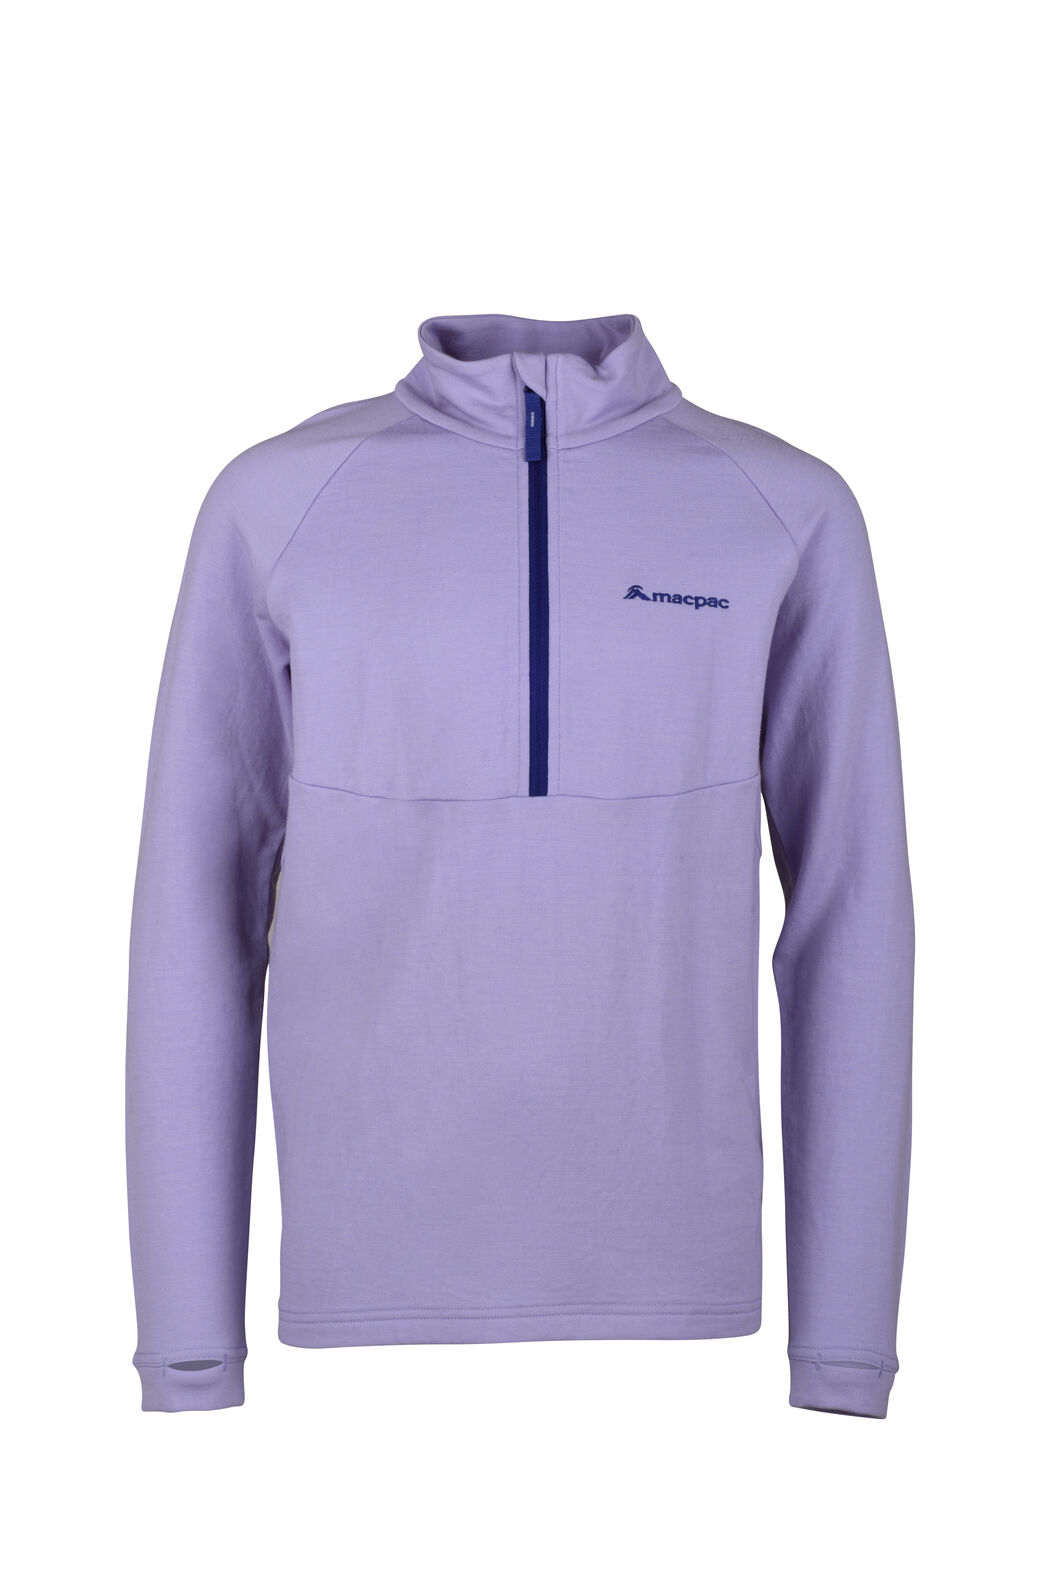 Macpac 280 Merino Pullover — Kids', Sweet Lavender, hi-res